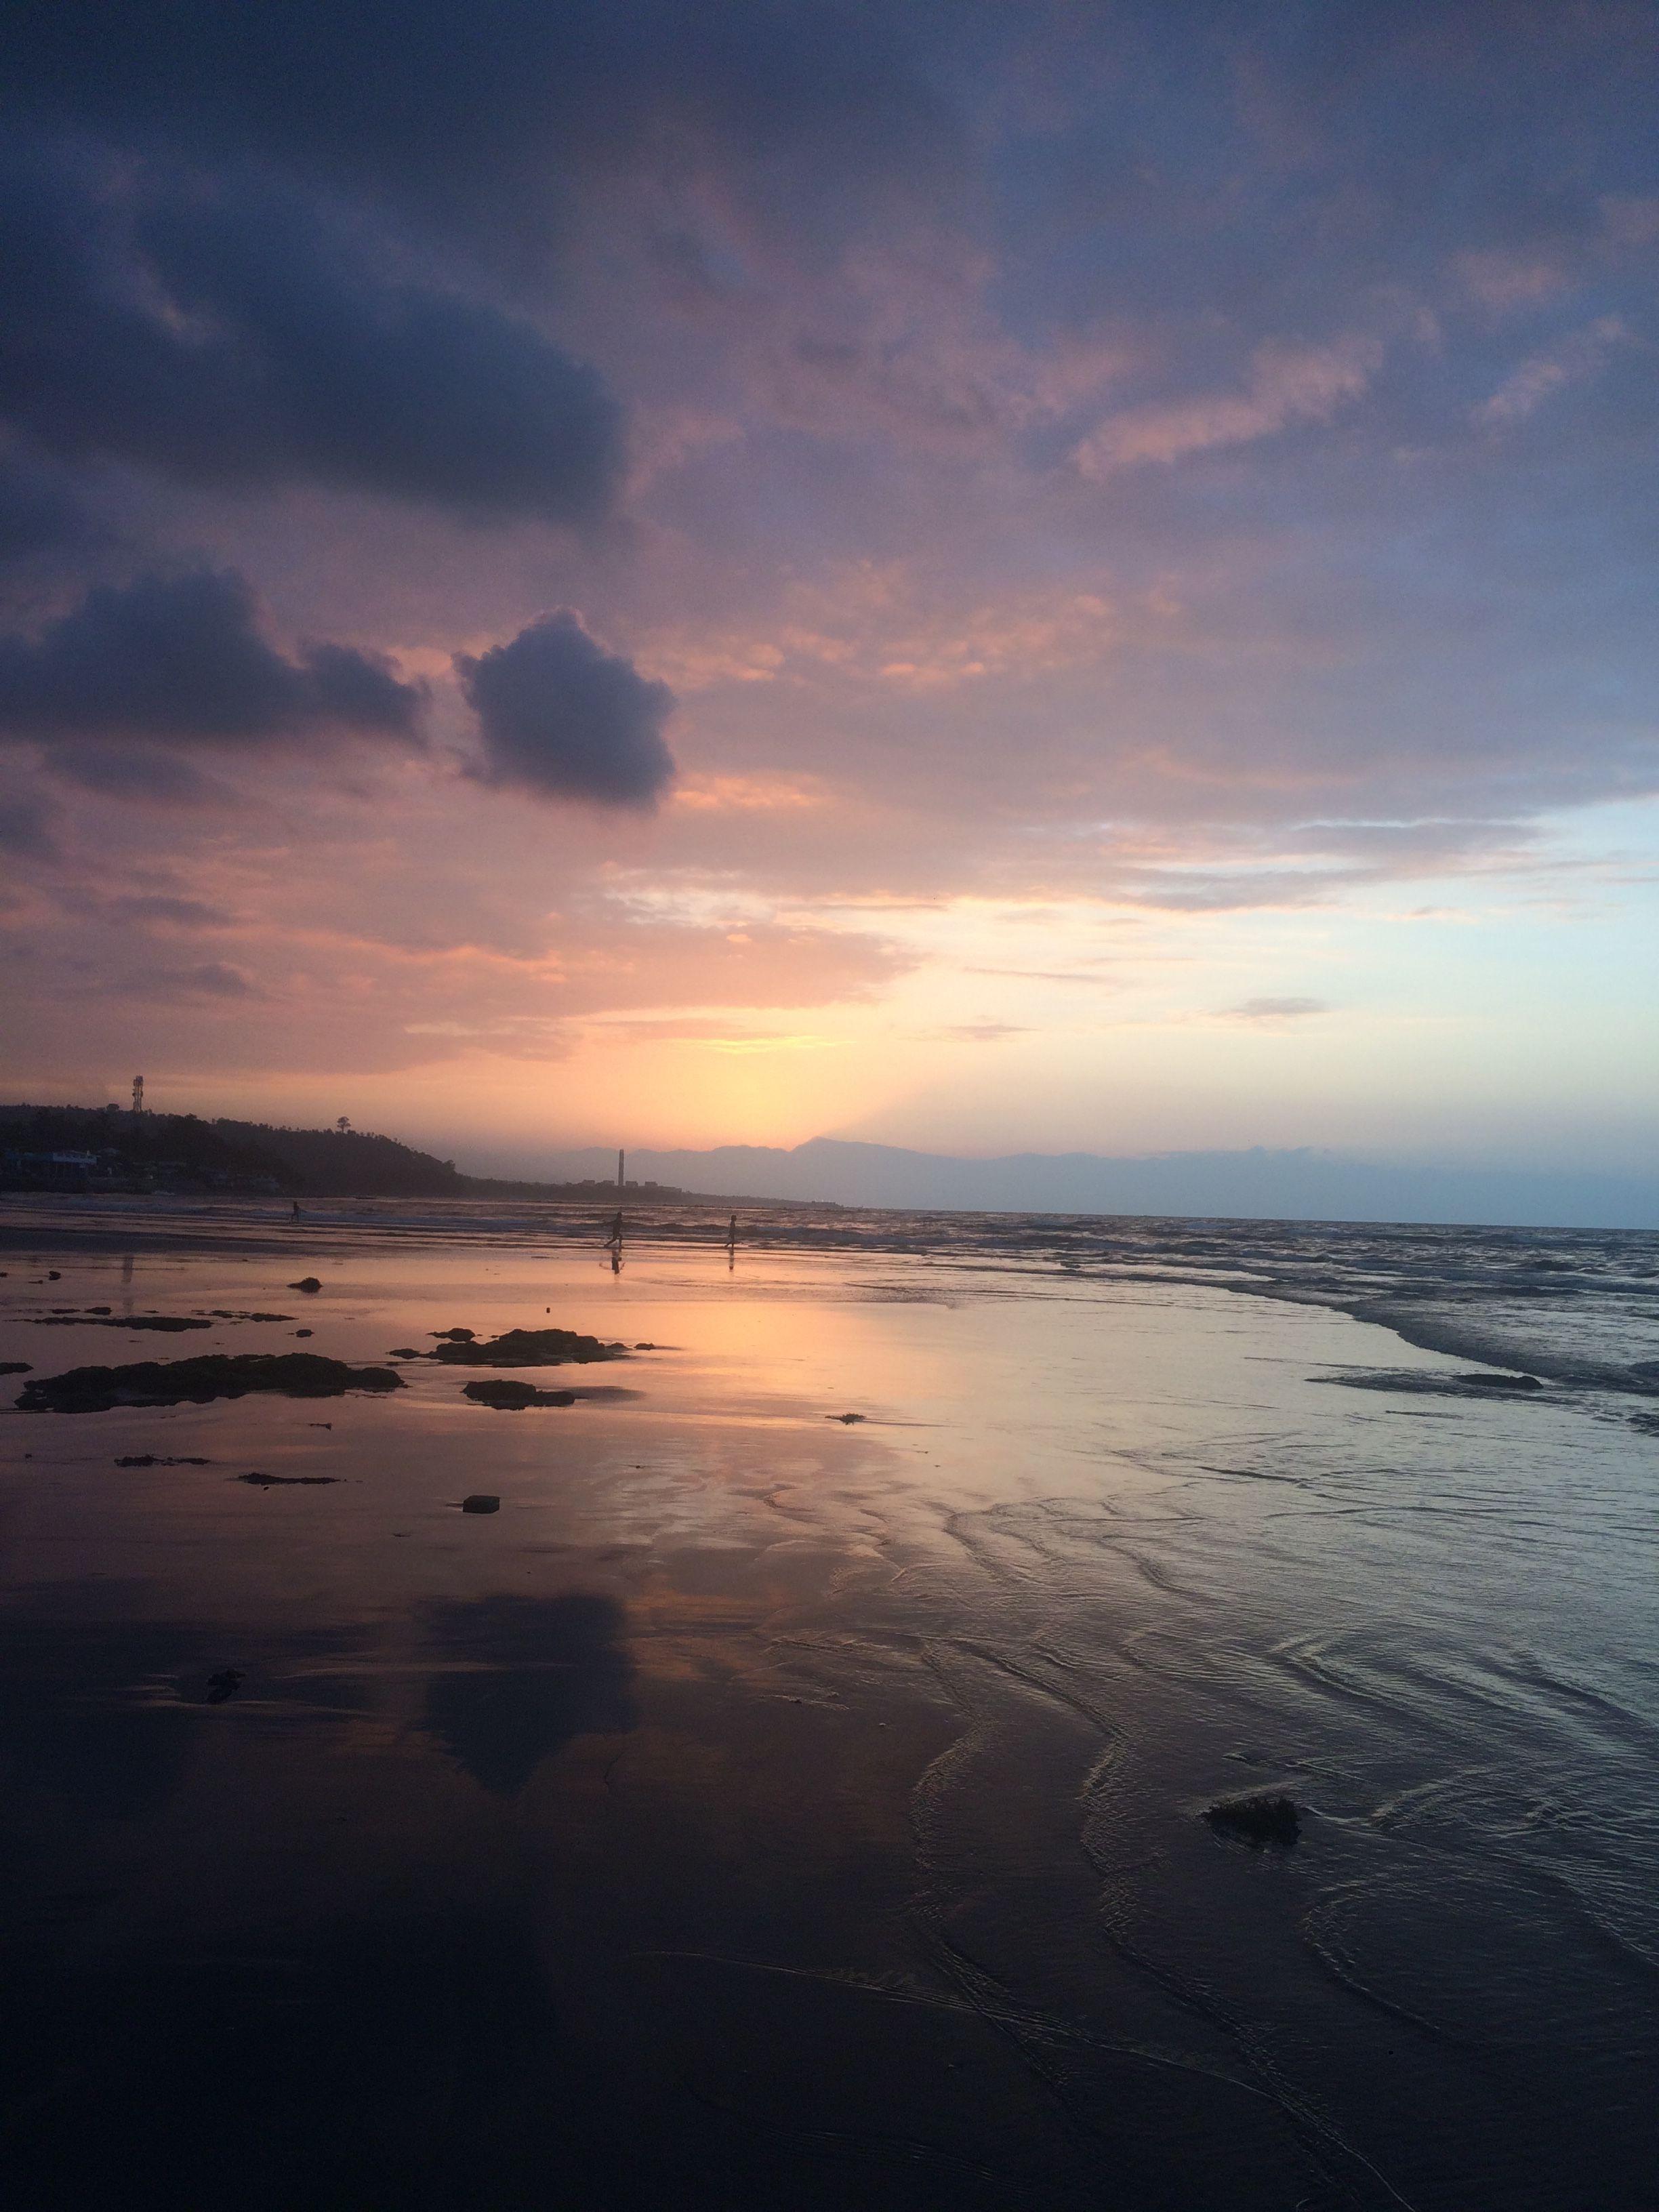 After sunset. #Horizon #Sunsetphotography #sunset #sunsetbeach #sunset